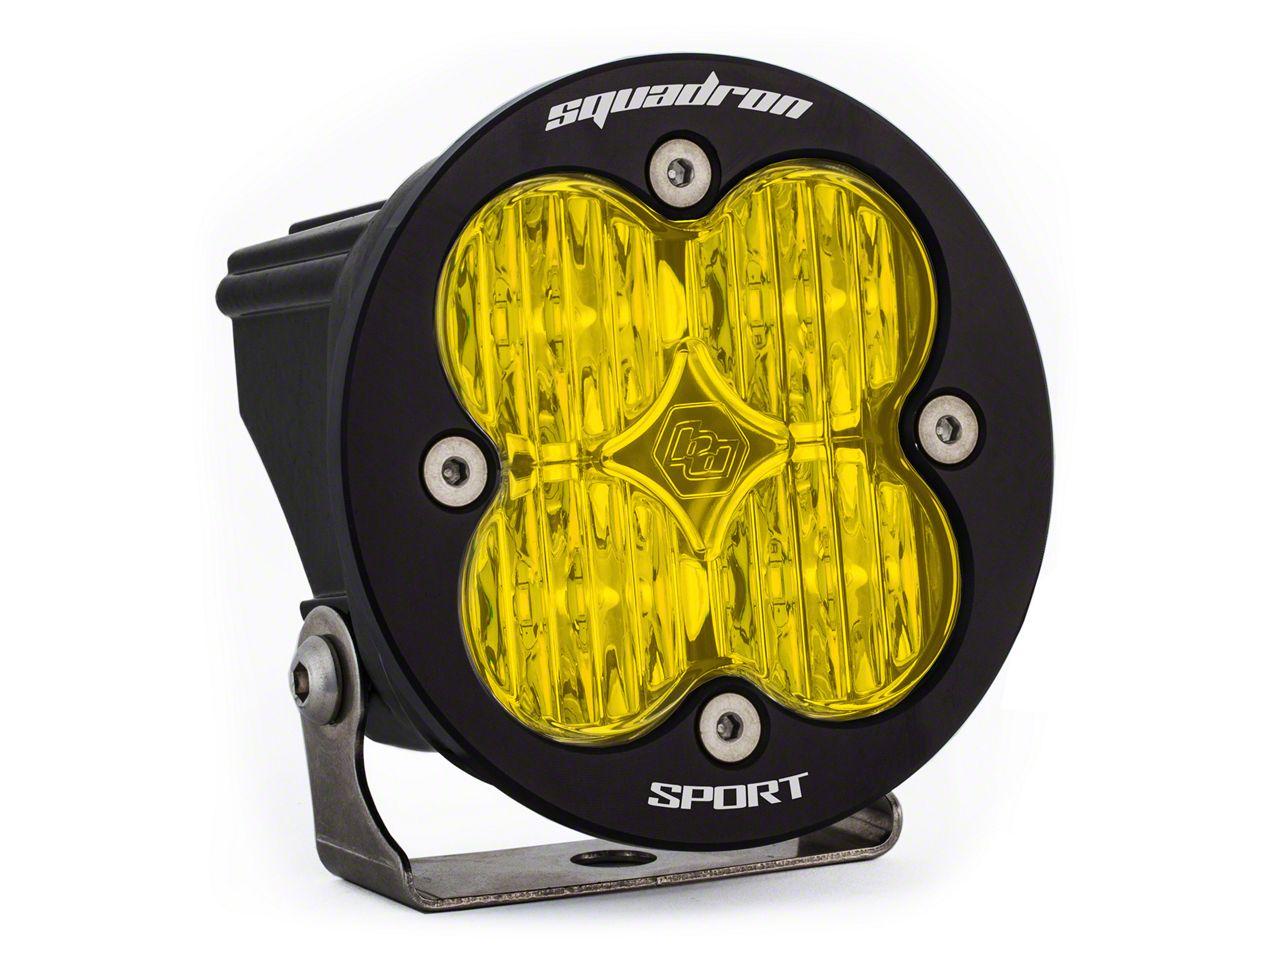 Baja Designs Squadron-R Sport Amber LED Light - Wide Cornering Beam